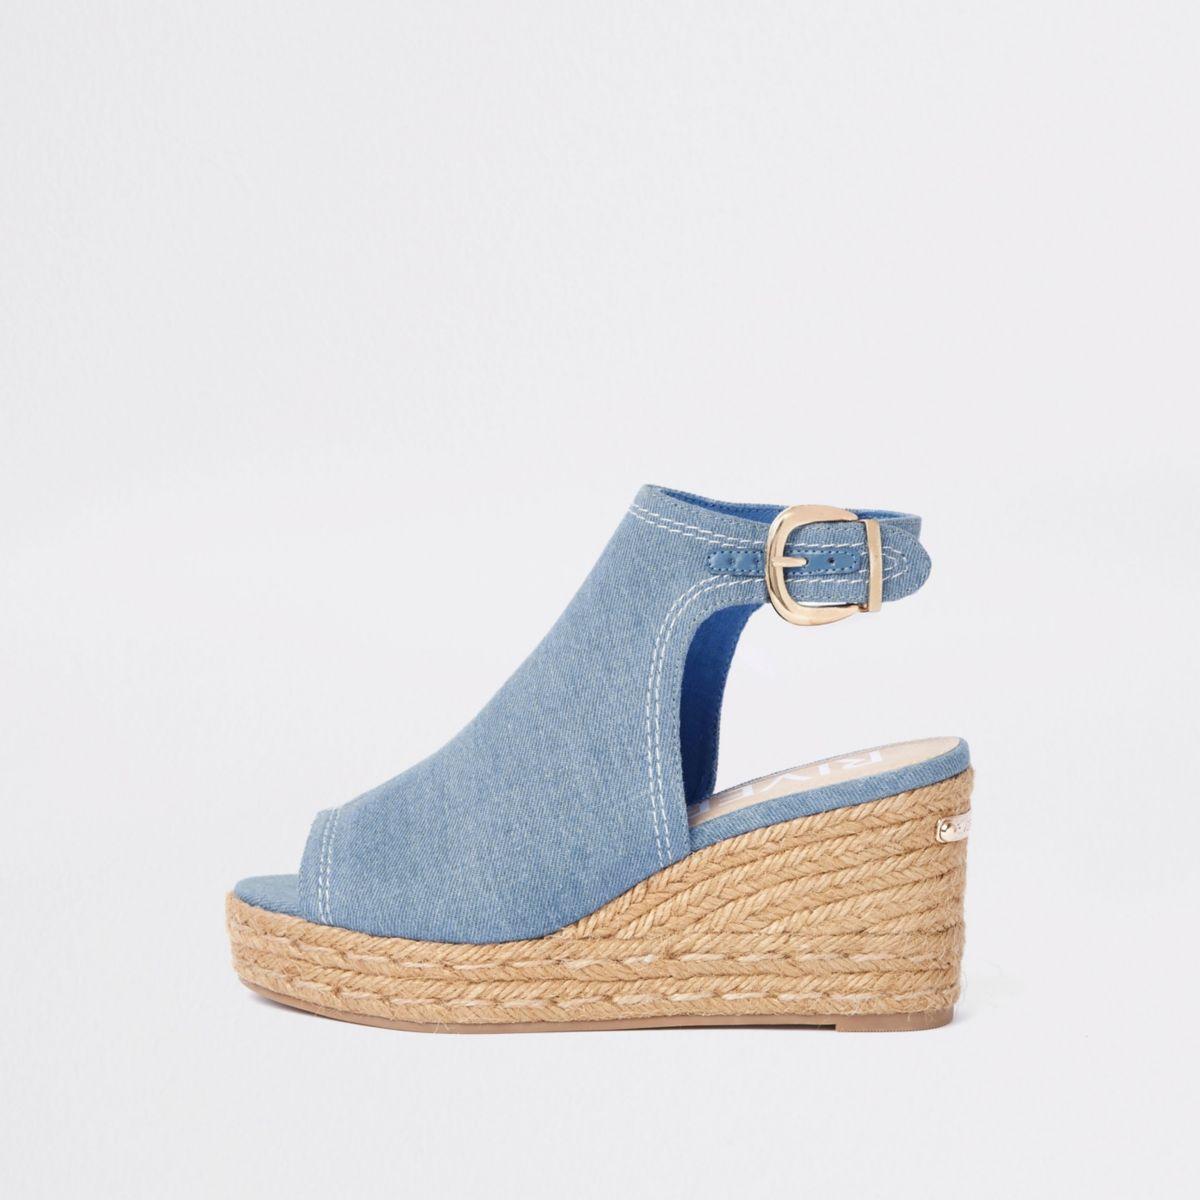 Blue denim espadrille wedge shoe boots